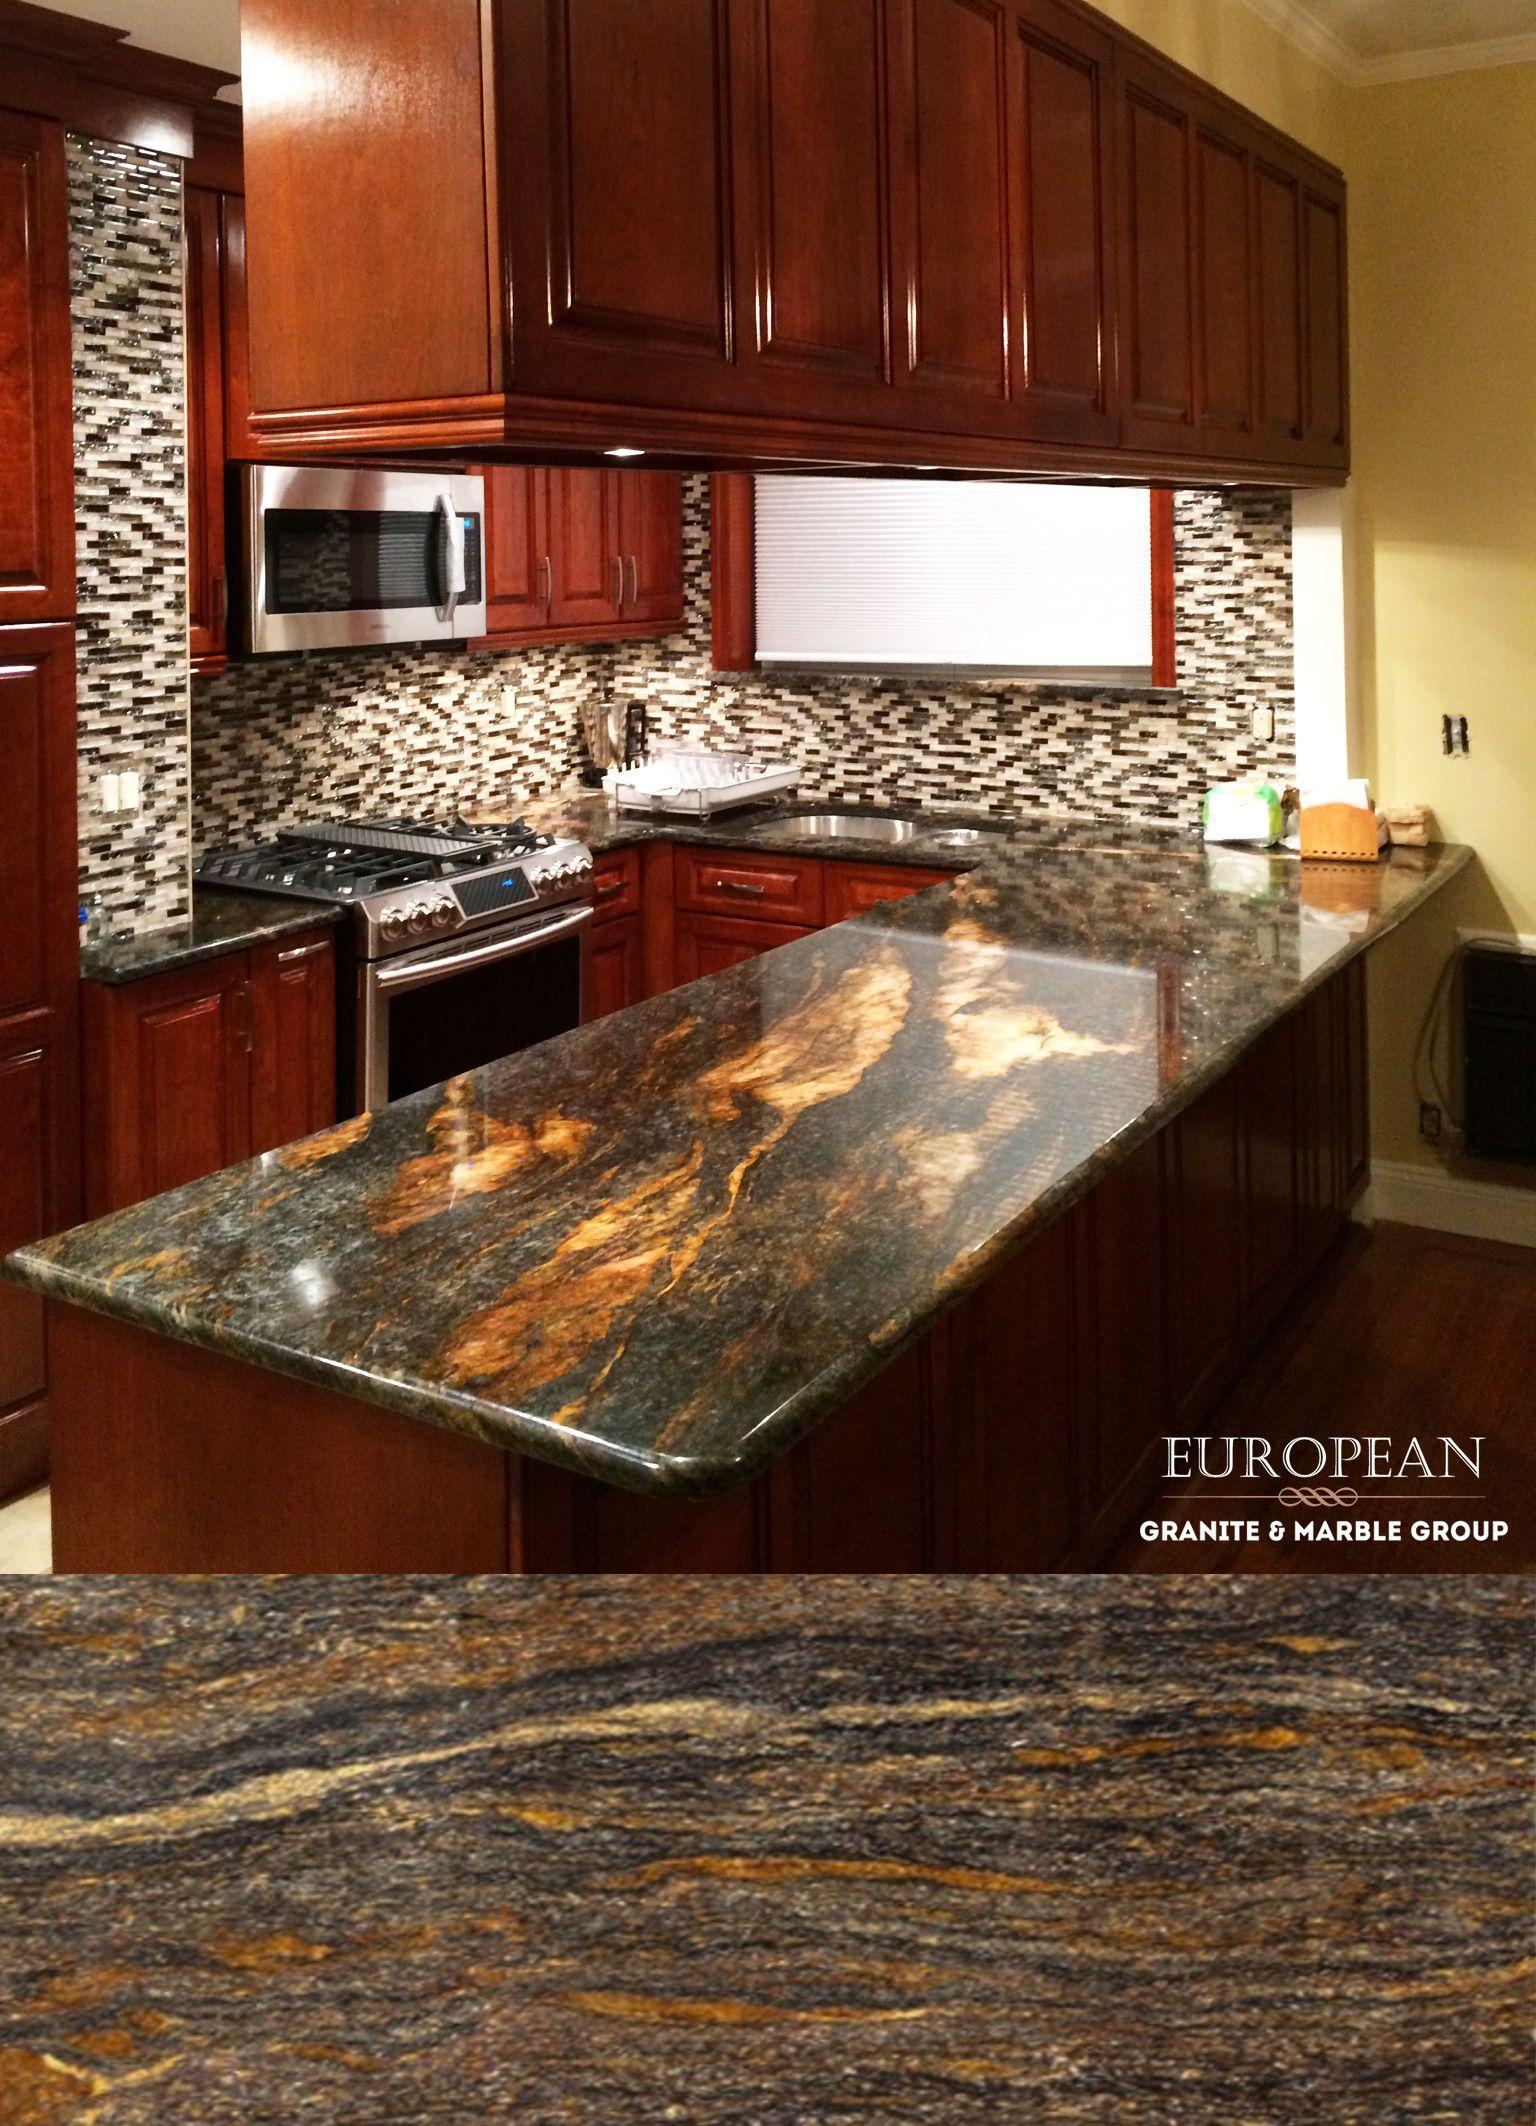 This Kitchen Design Features Orion Granite Countertops Orion Granite Has A Medi Outdoor Kitchen Countertops Best Kitchen Designs Granite Countertops Kitchen